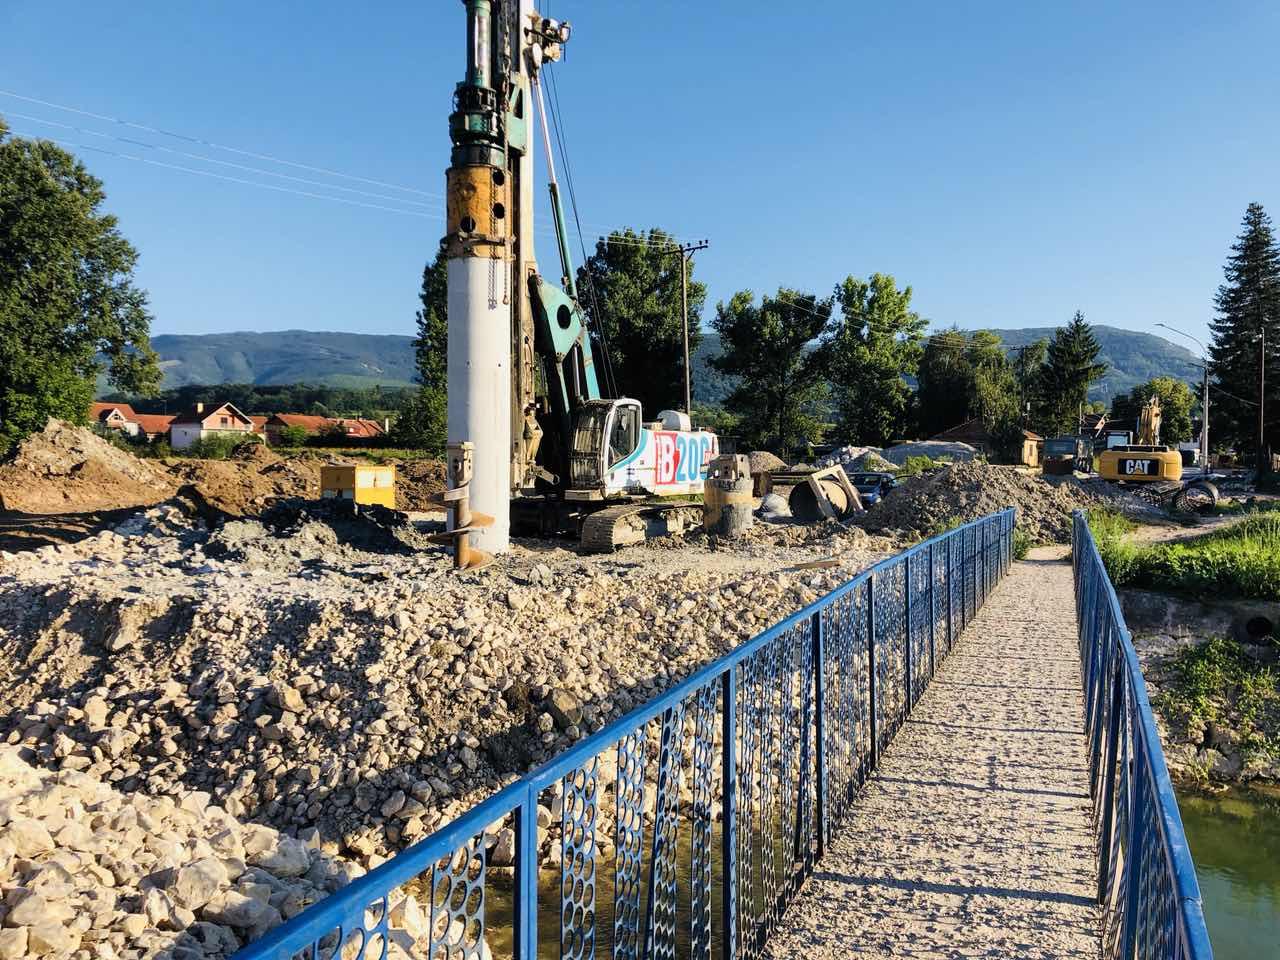 Izgradnja po planu: Gradi se novi most na reci Svrljiški Timok